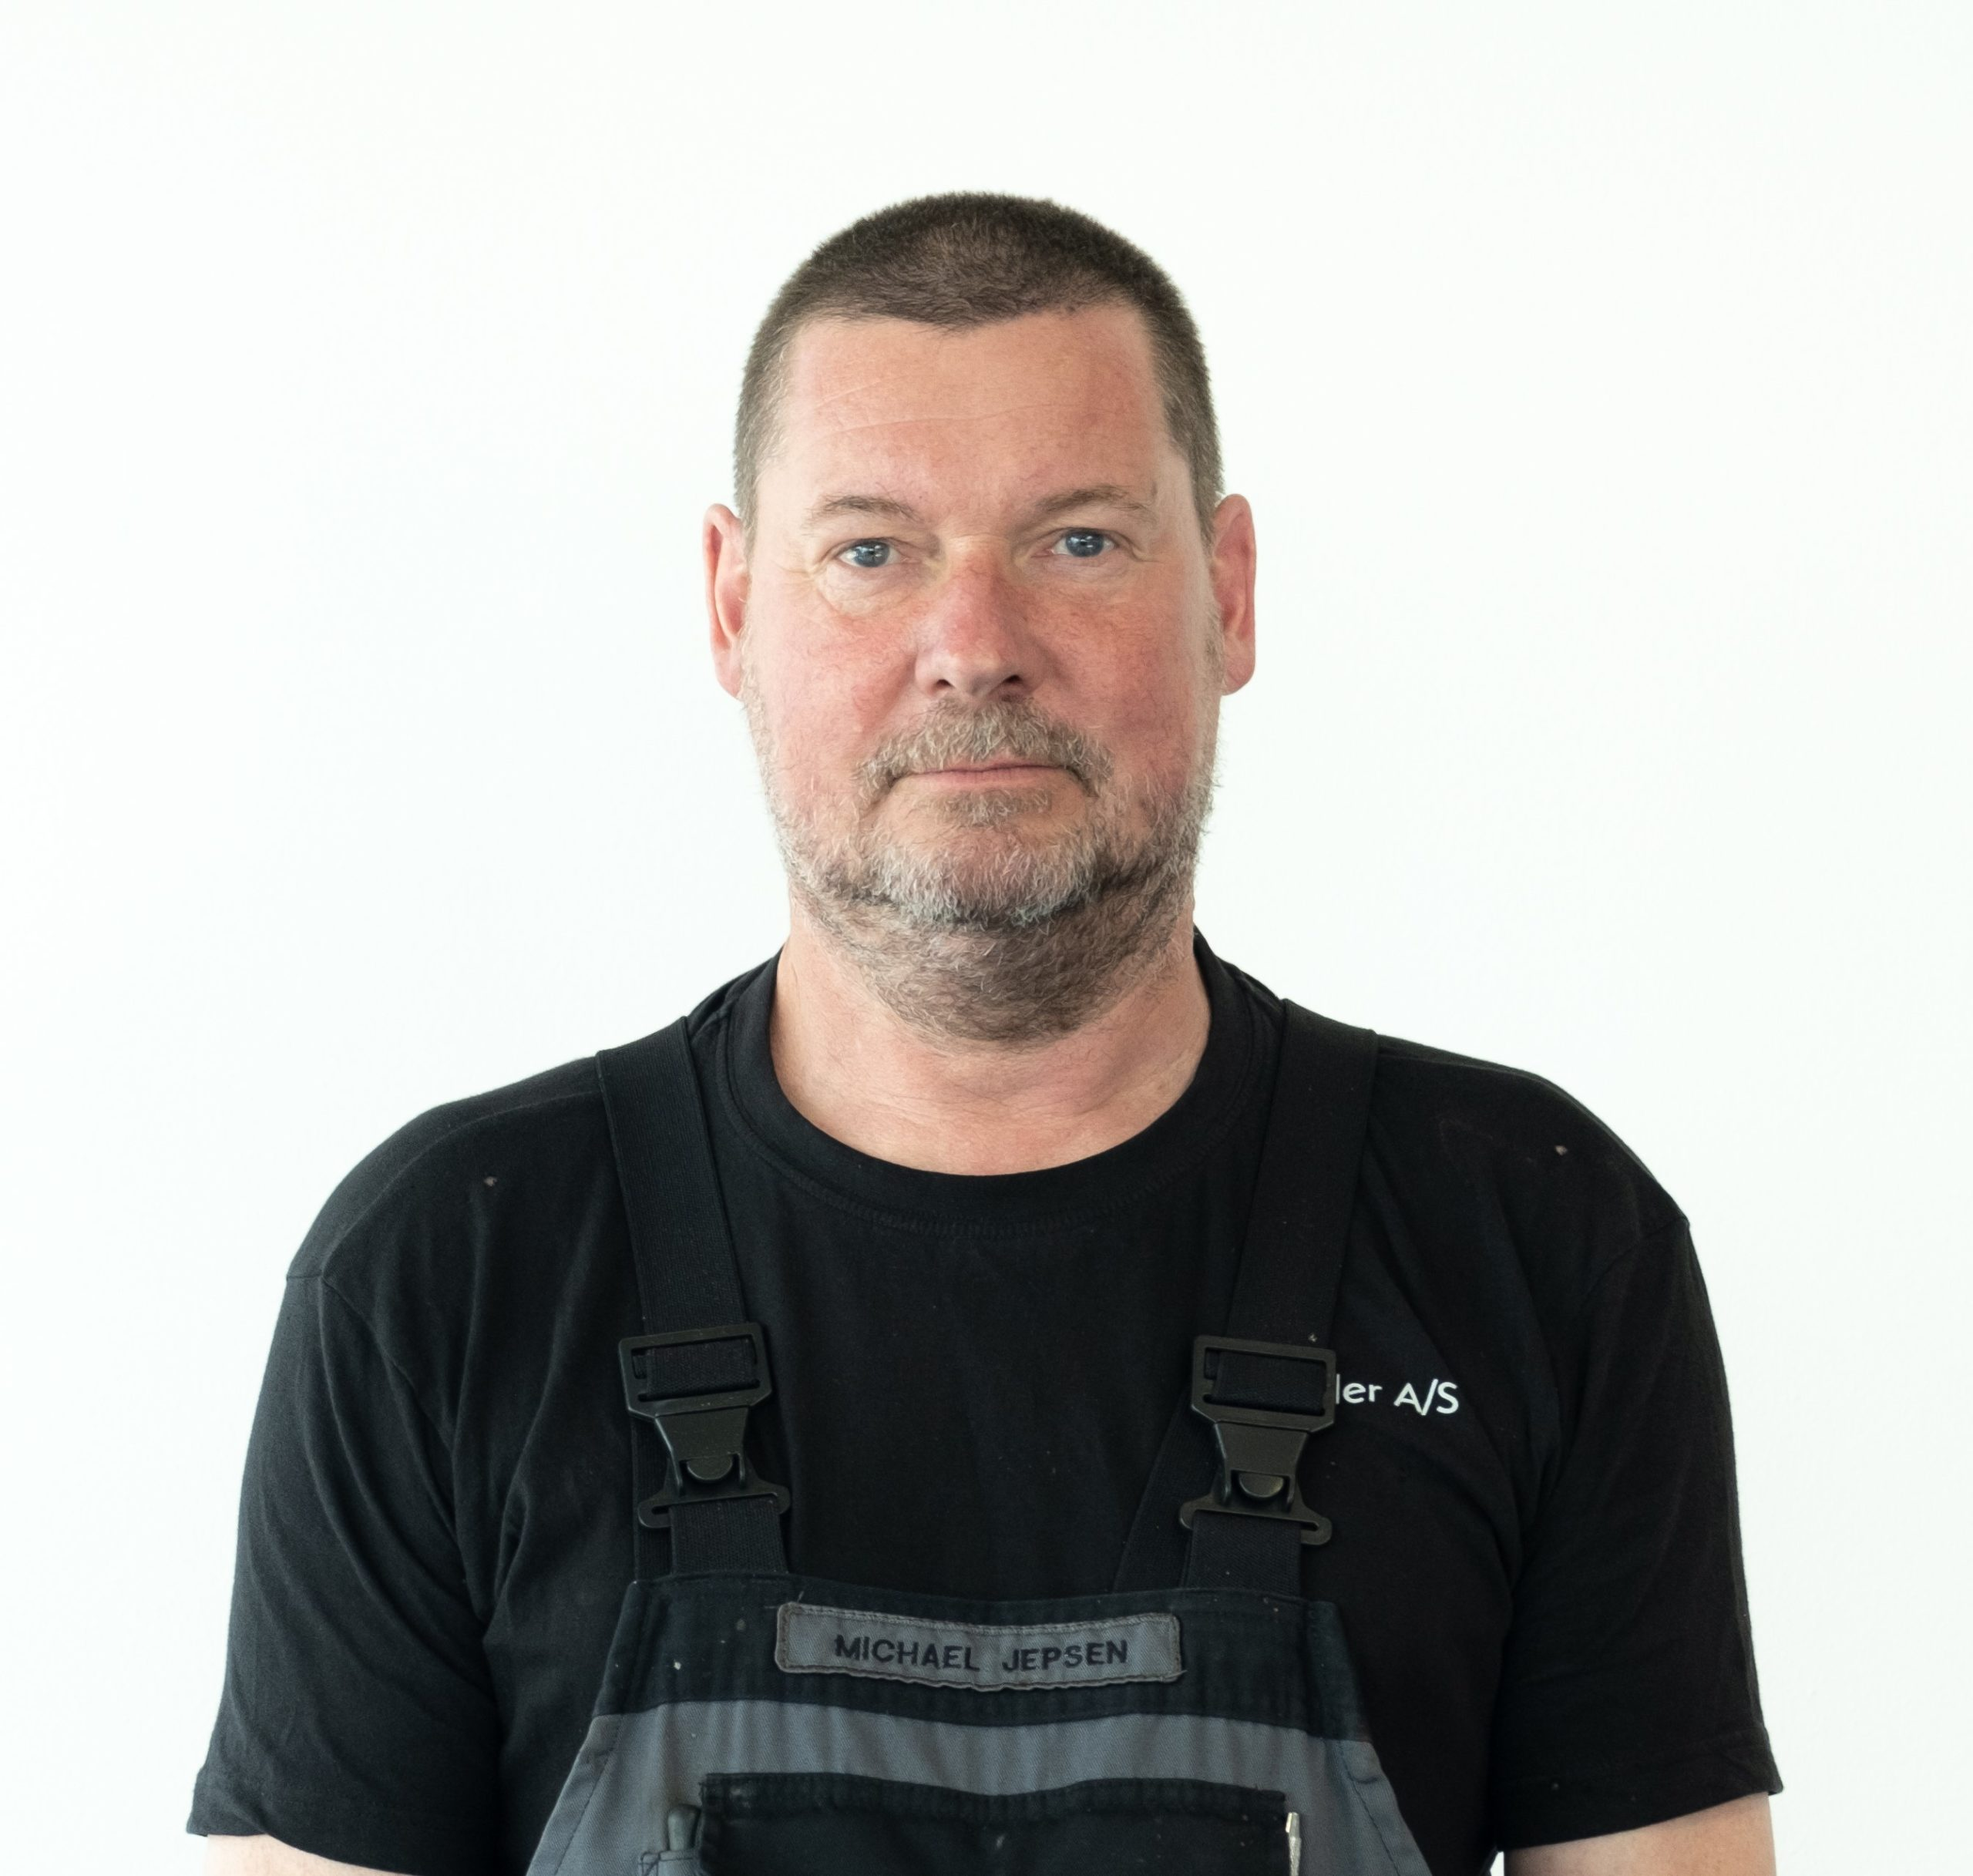 Michael Jepsen